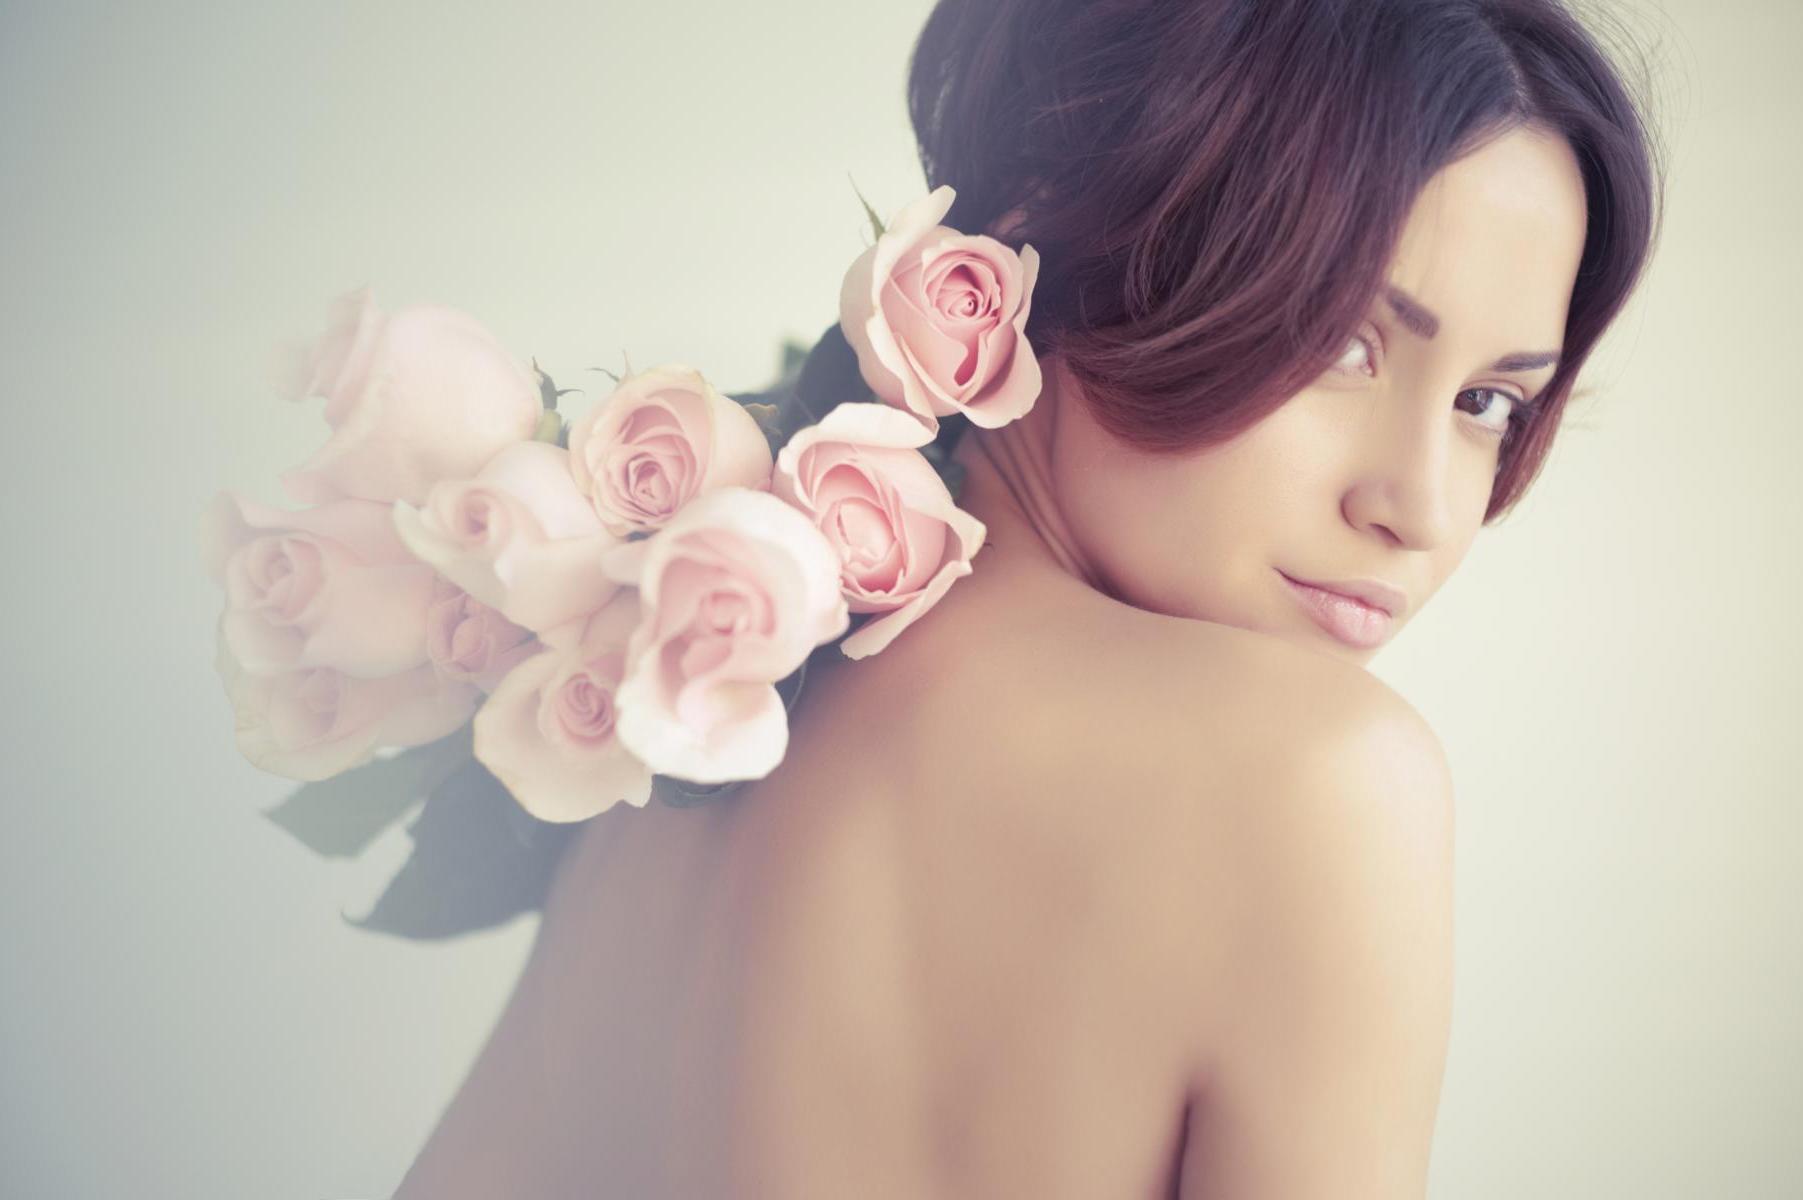 Haut Manufaktur kosmetik kosmetikstudio motiv frau mit rosen 3